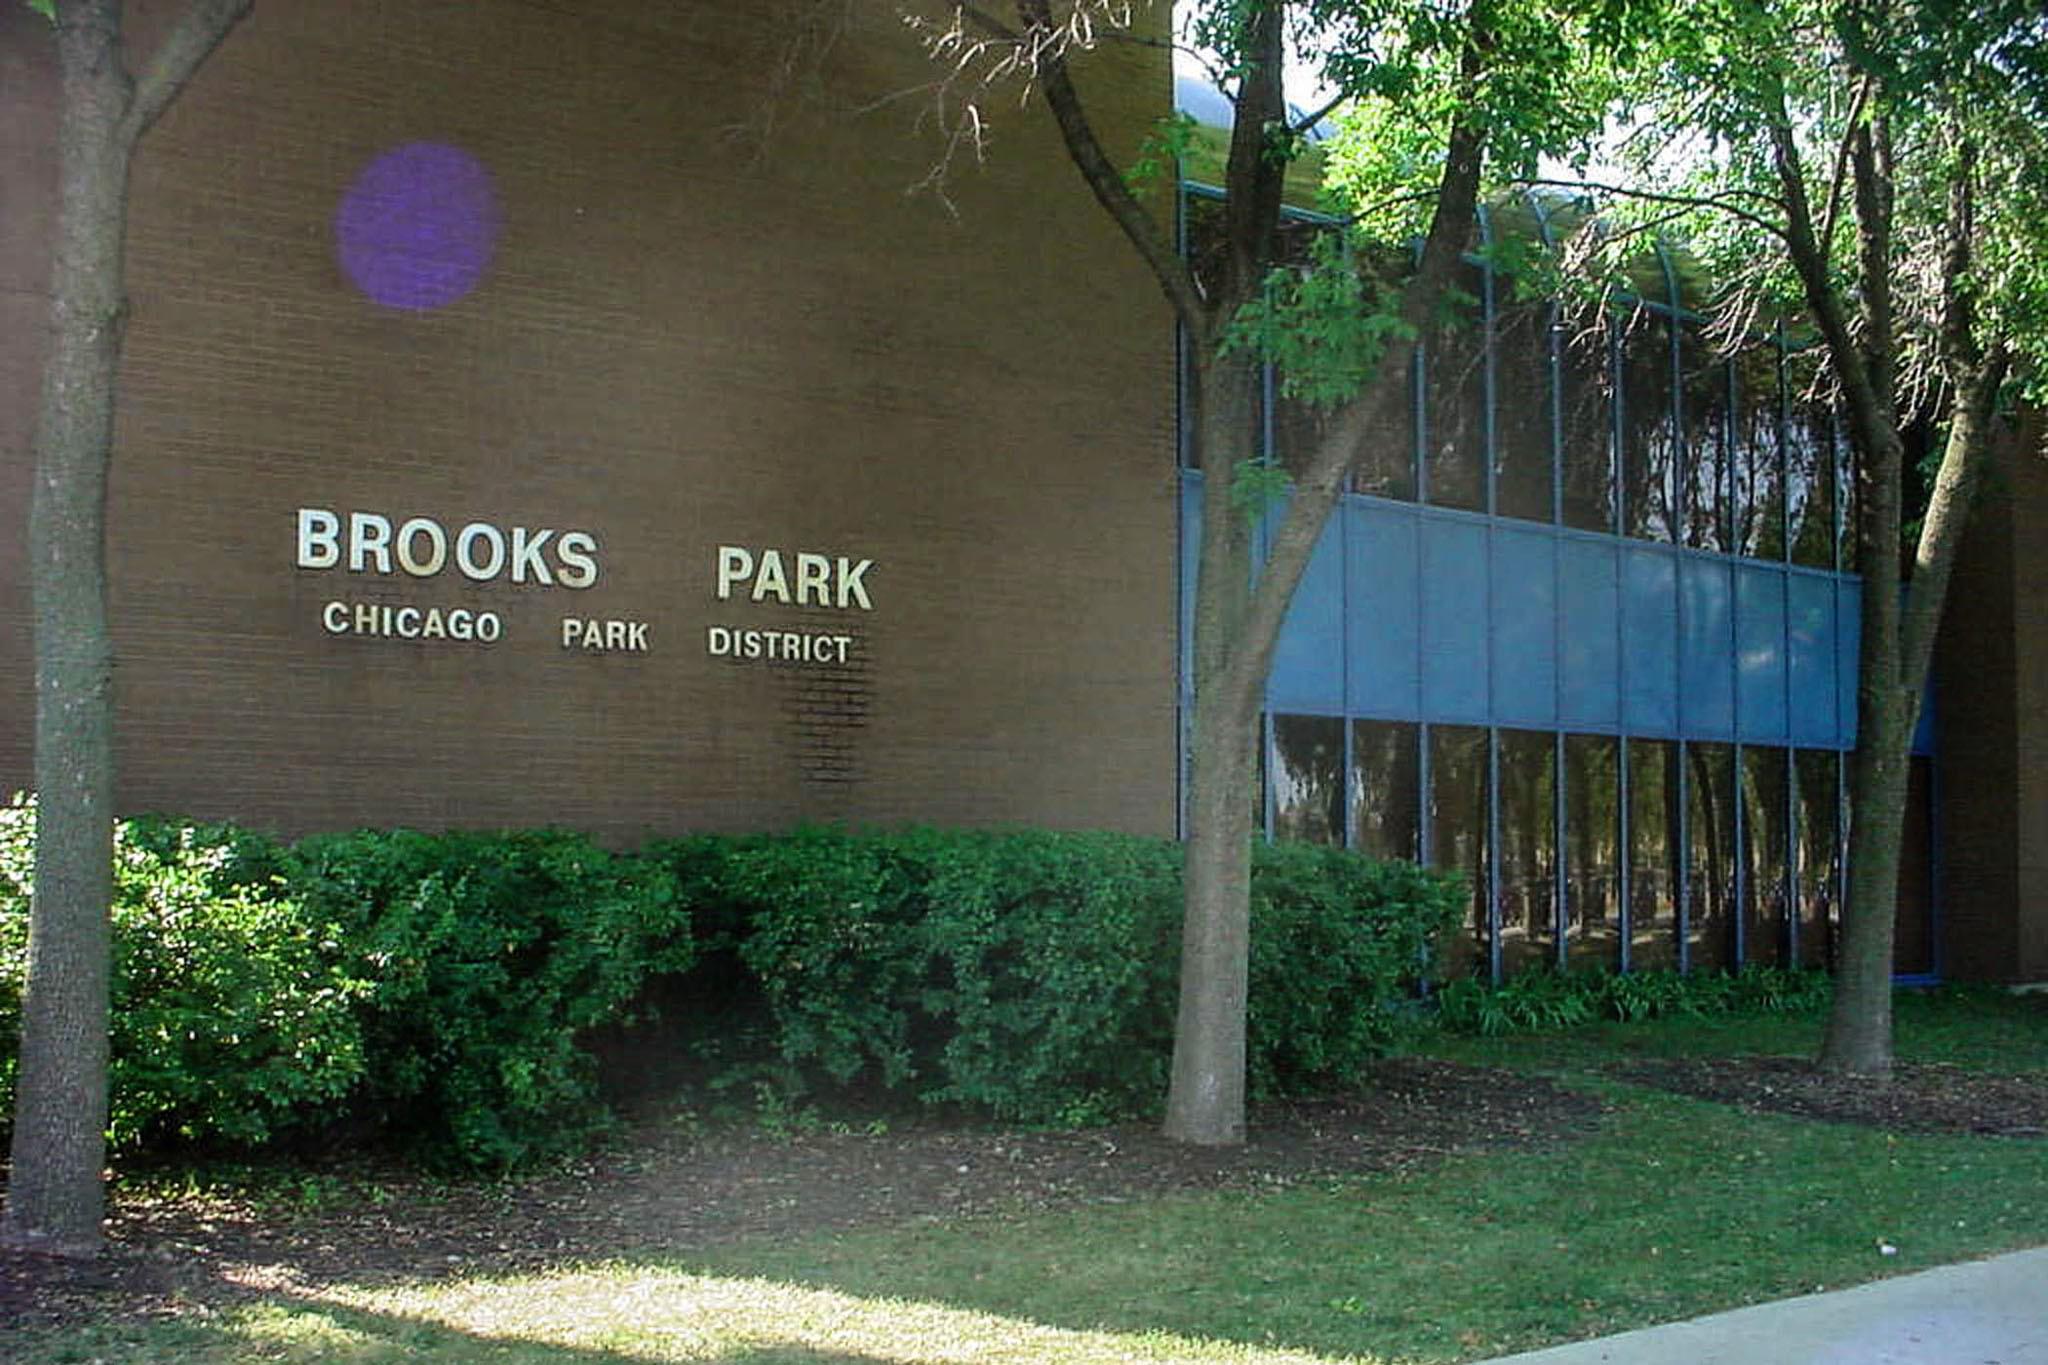 Brooks Park